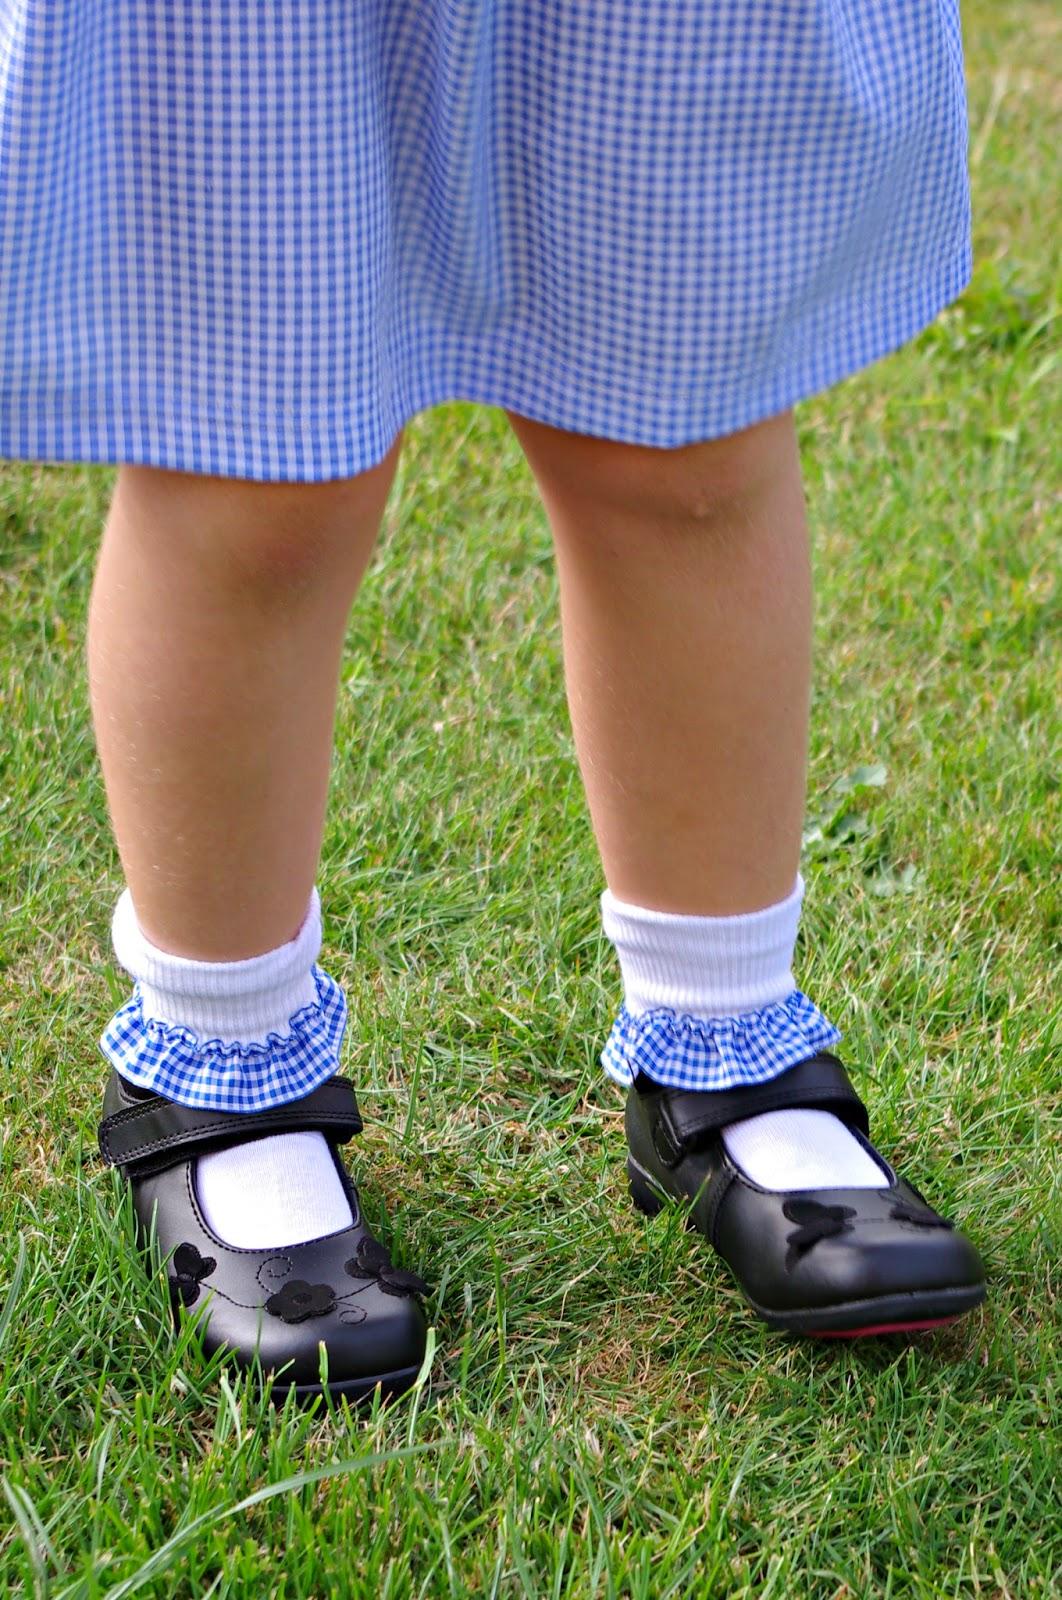 School uniform for girls at Matalan